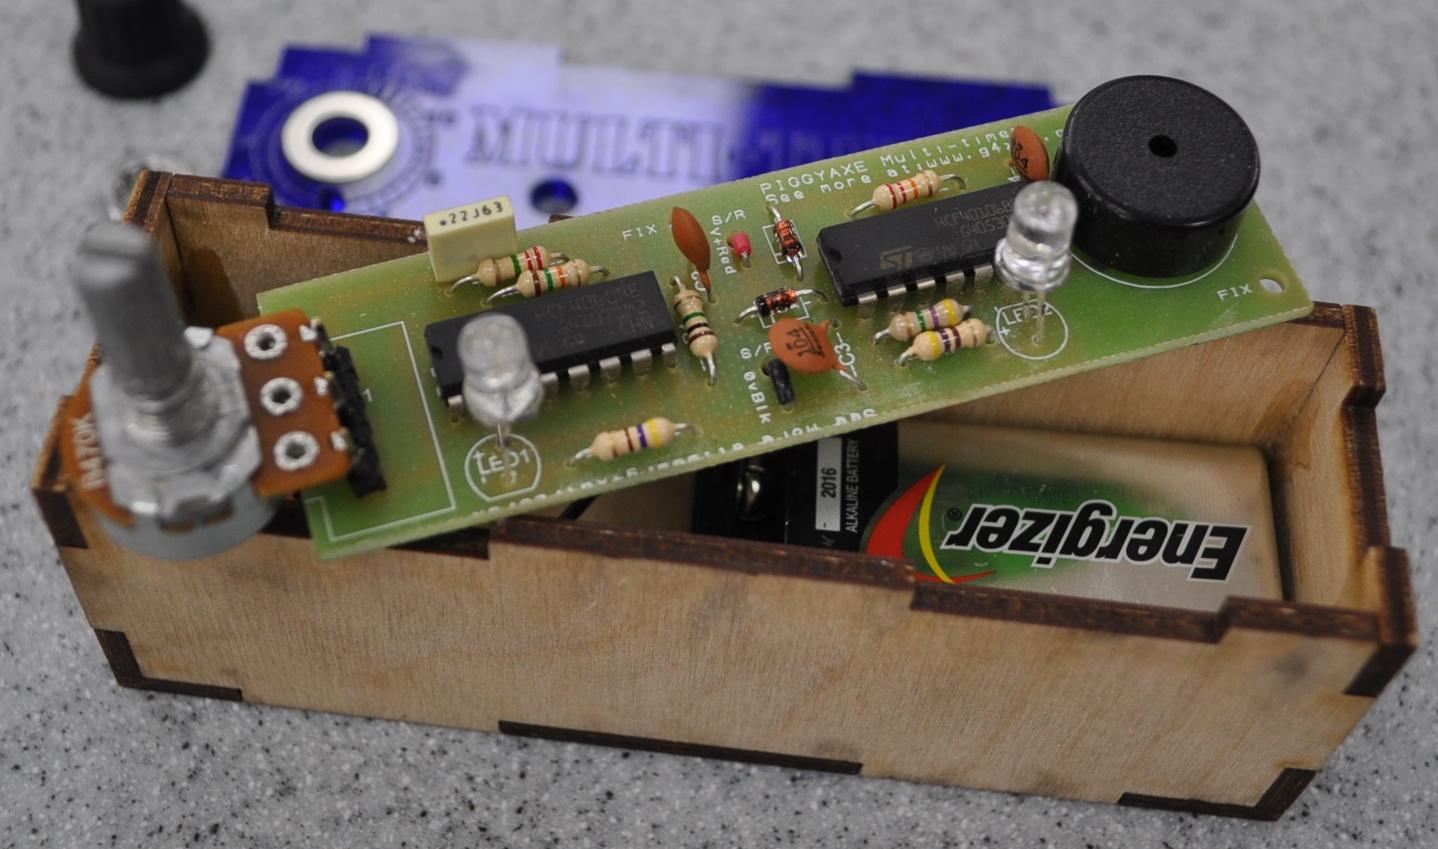 Basic Electronics G4xat Electronix The Alternating Led Flasher Circuit With A 555 Ic Pocket Timer 2